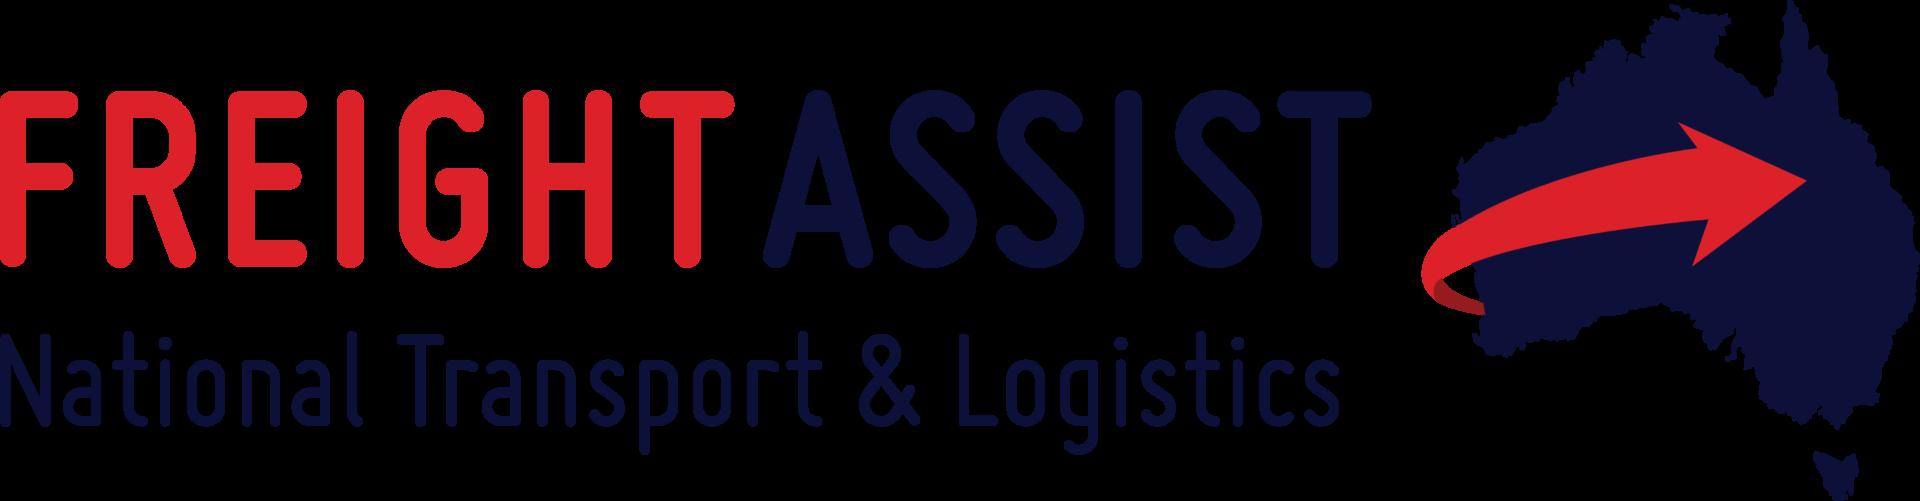 Freight Assist Australia Pty Ltd